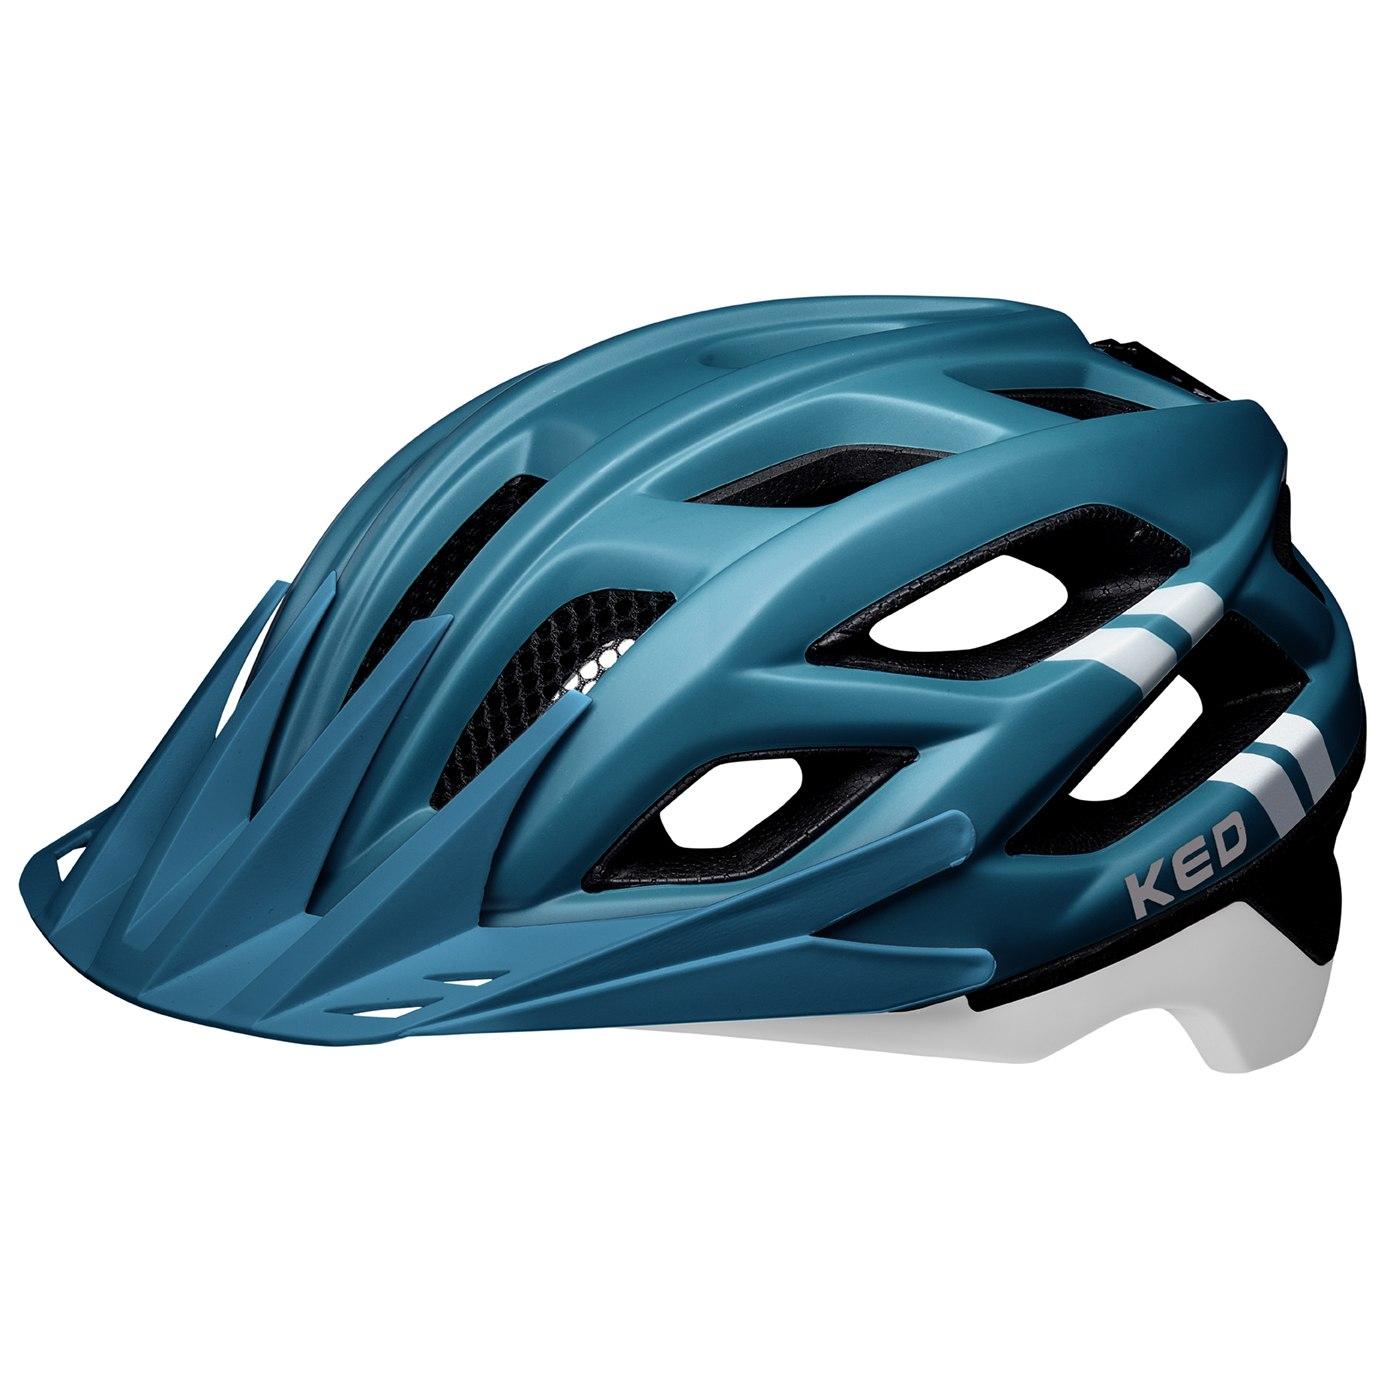 KED Companion Helm - blue white matt